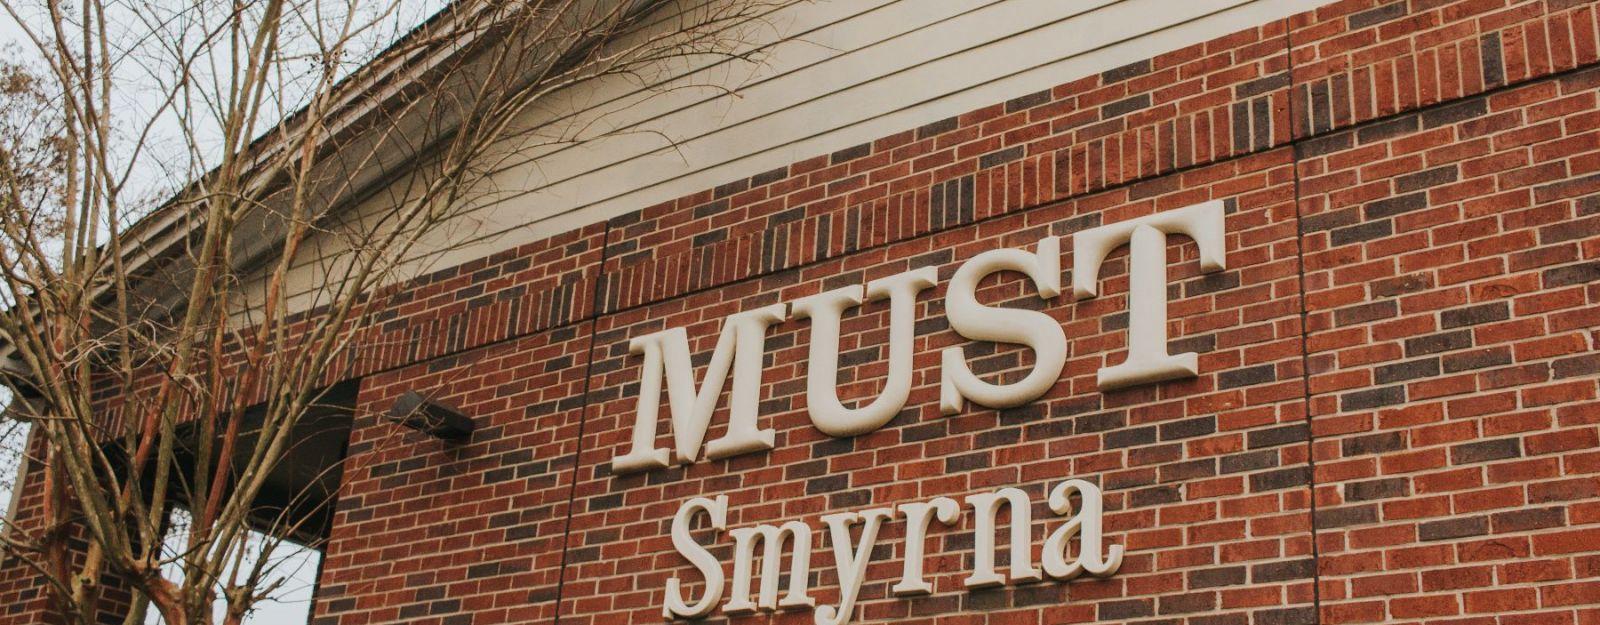 Smyrna Locations Must Ministries